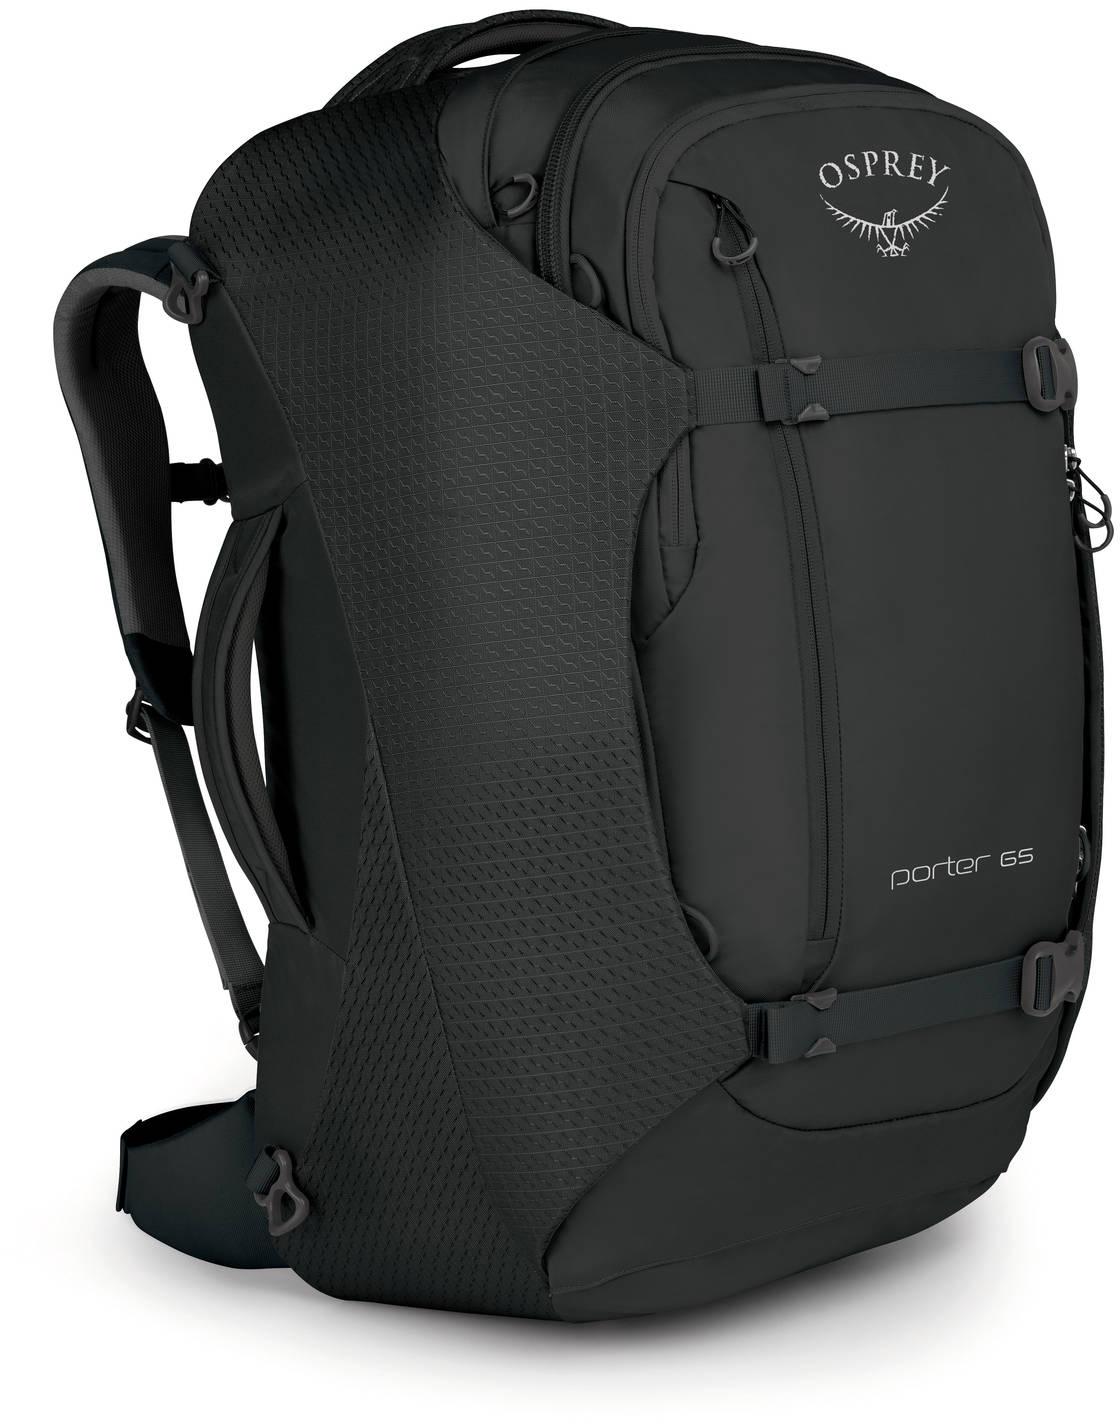 Сумки-рюкзаки Сумка-рюкзак Osprey Porter 65 Black Porter_65_F17_Side_Black_web.jpg